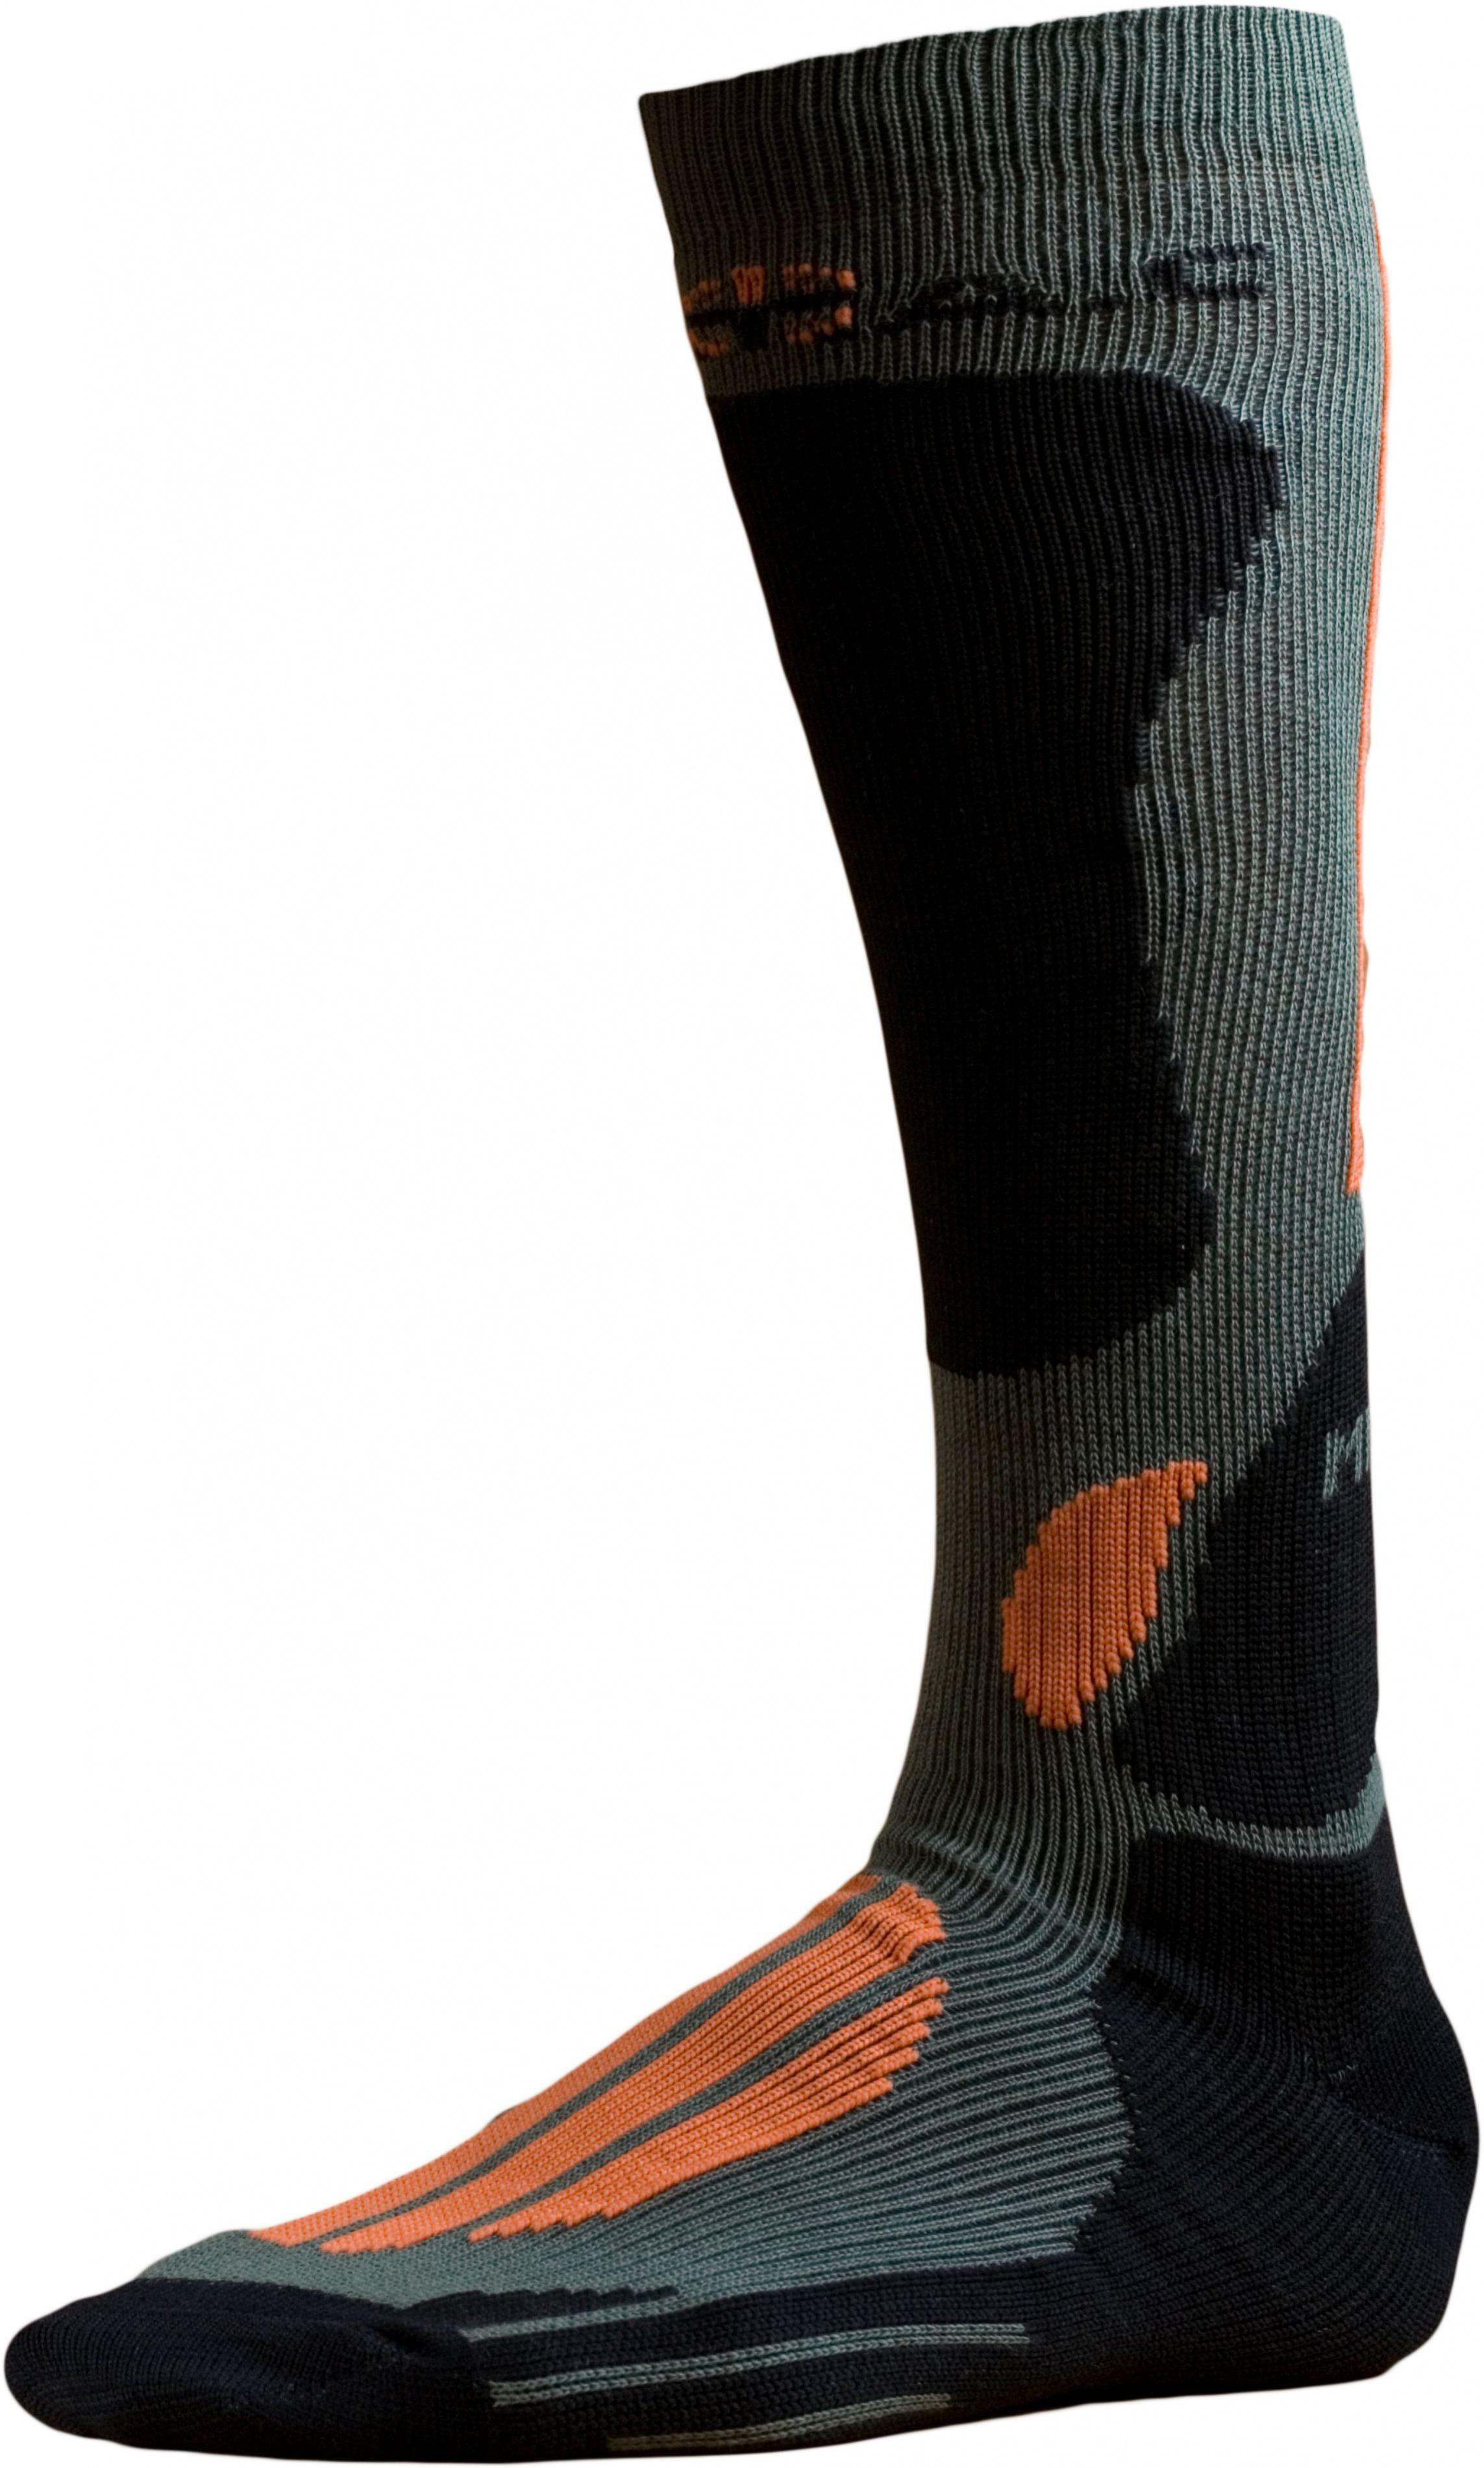 Ponožky BATAC Mission MI02 vel. 42-43 - olive/orange